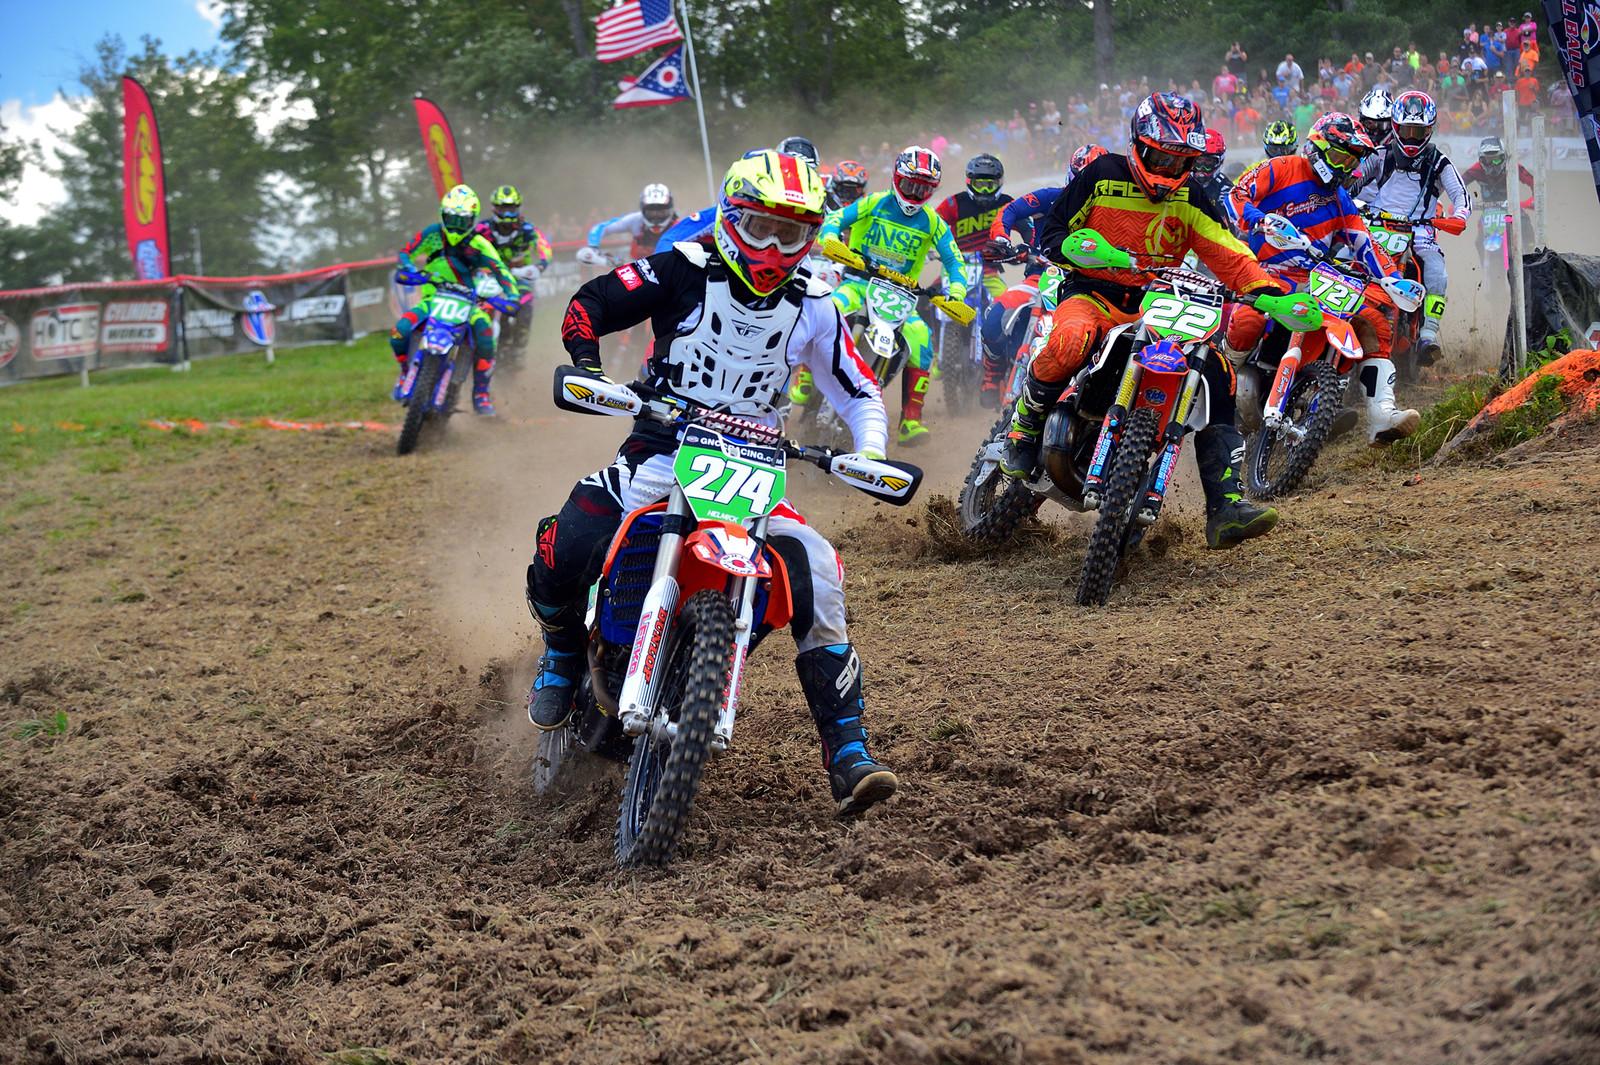 Harrison Helmick - John Penton GNCC - Motocross Pictures - Vital MX